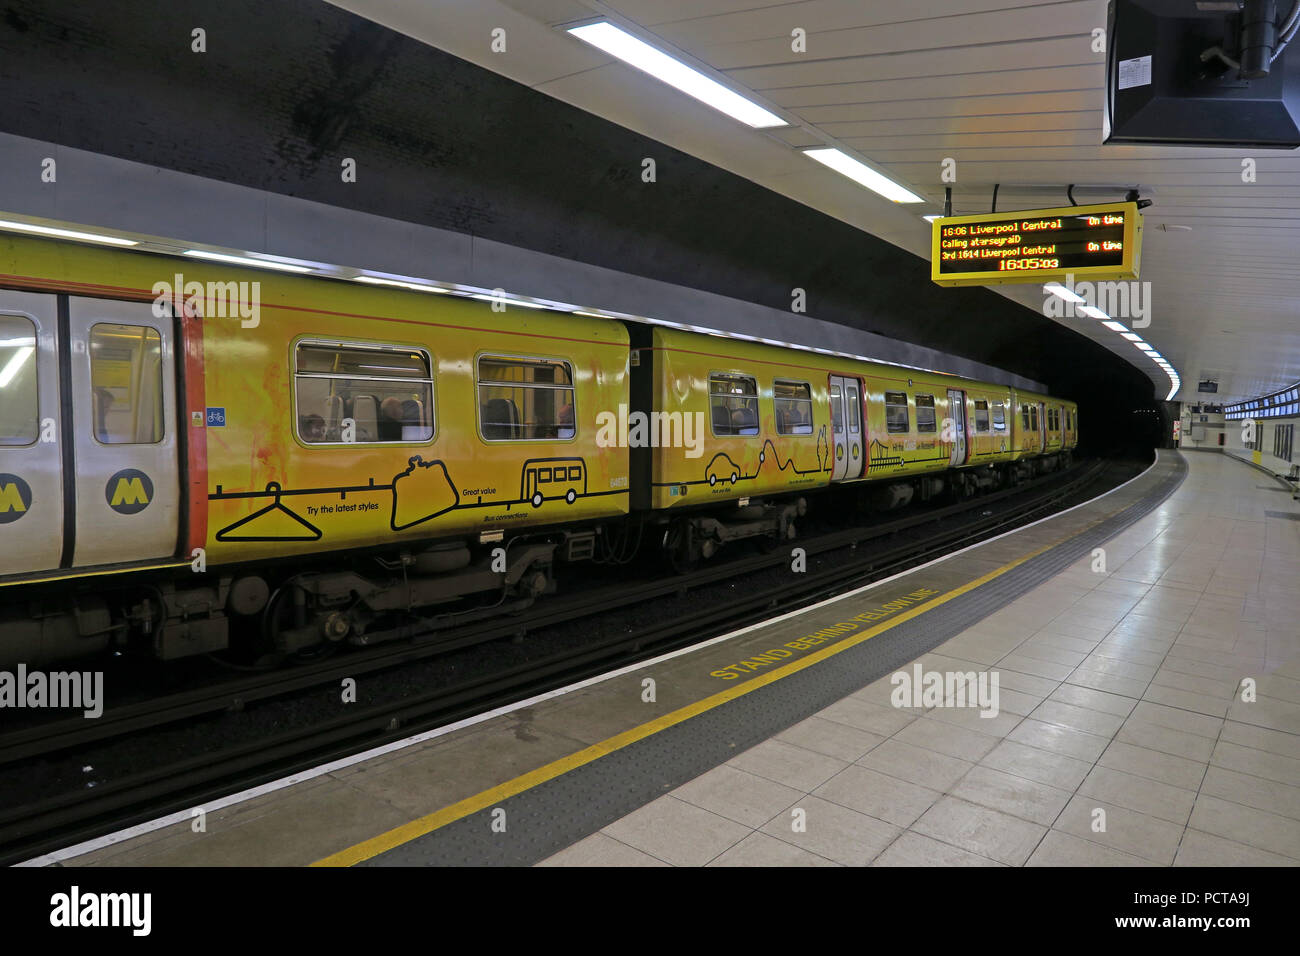 Laden Sie dieses Alamy Stockfoto Gelbe Merseyrail, Liverpool EWU-U-Bahn, in Birkenhead Hamilton Square Bahnhof, Merseyside, North West England, Großbritannien - PCTA9J